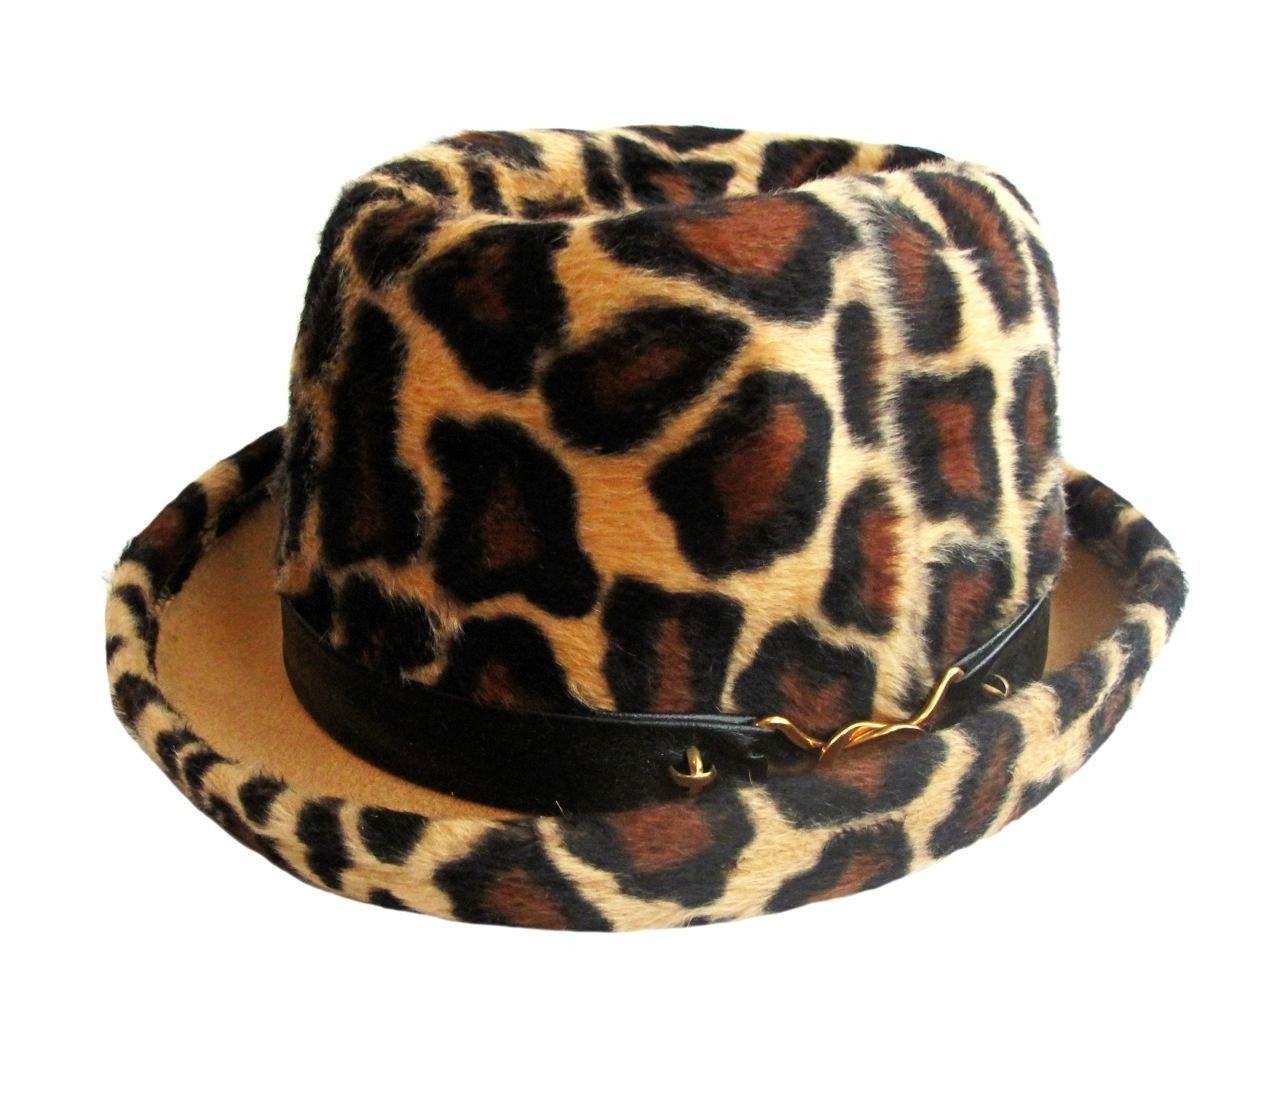 fb09adbdaed09 A Rare YSL Vintage Leopard Print Hat Yves Saint Laurent 1970s at 1stdibs